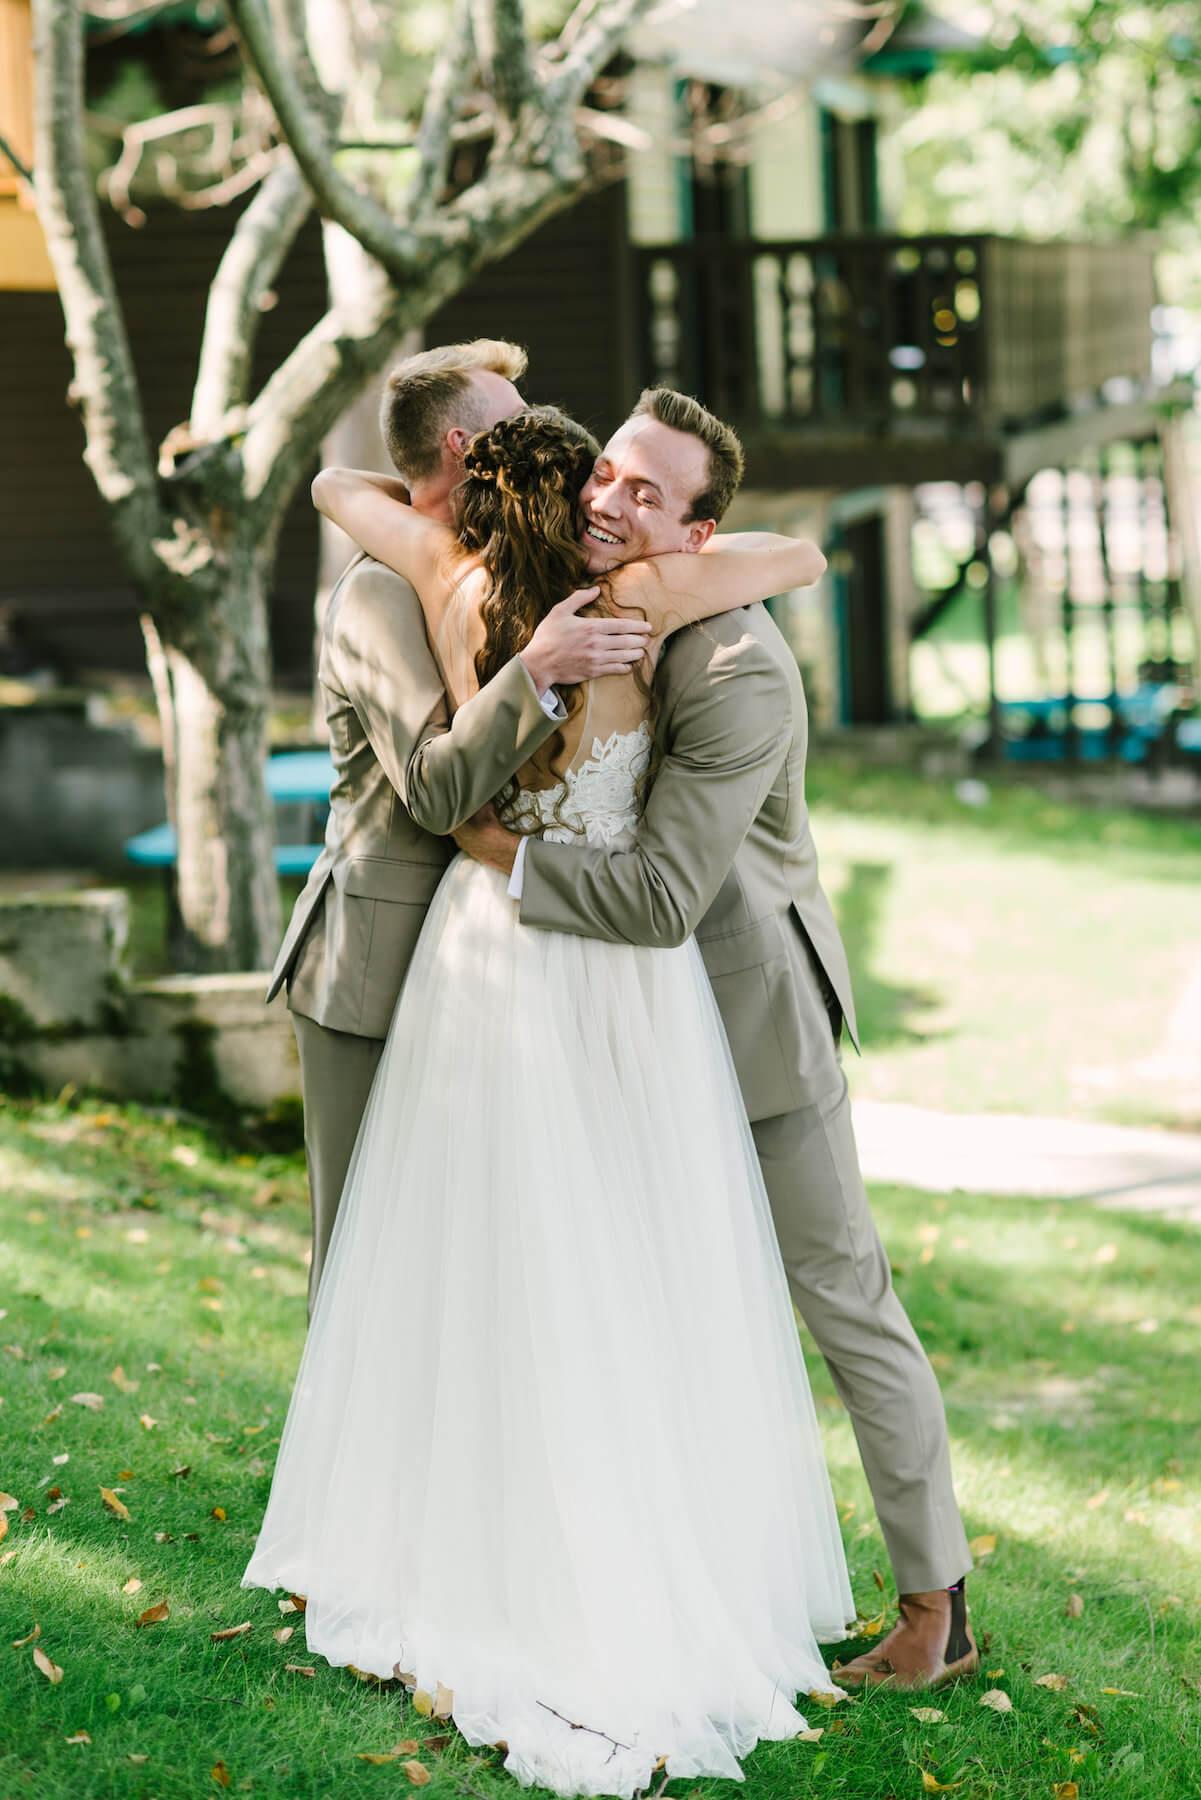 engle-olson-wedding-blair-taylor-13.jpg